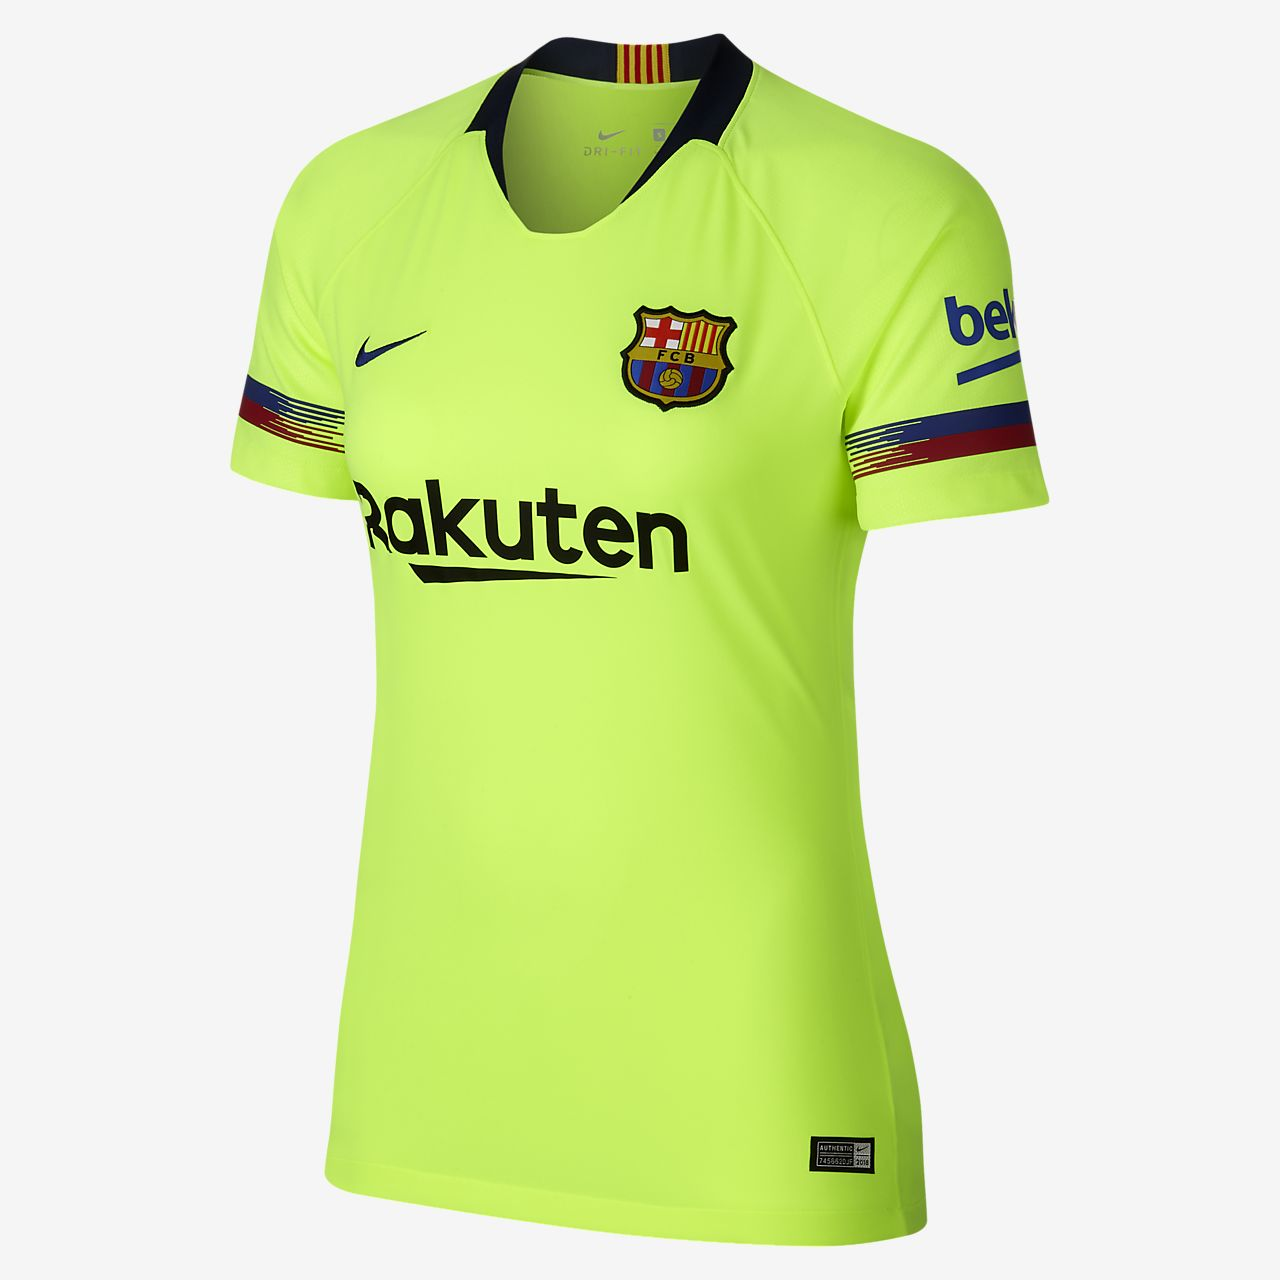 2018/19 FC Barcelona Stadium Away Damen-Fußballtrikot